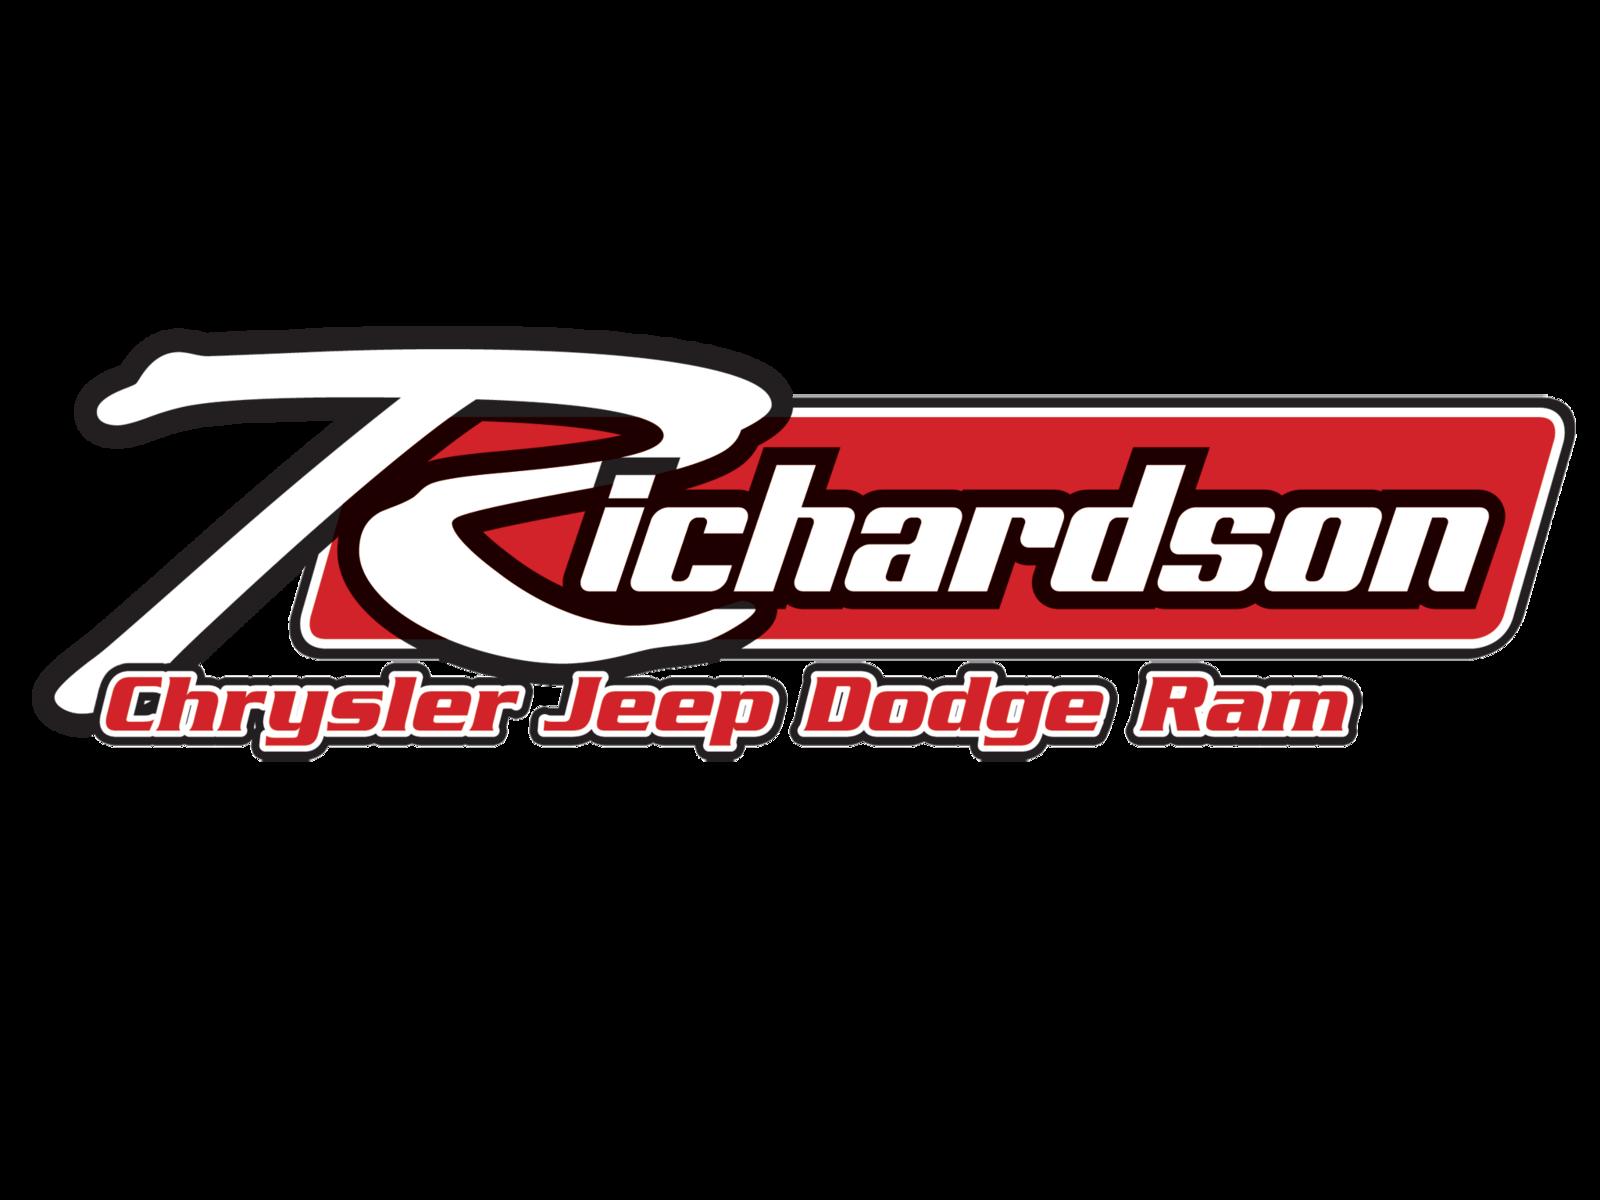 richardson chrysler jeep dodge ram - richardson, tx: read consumer